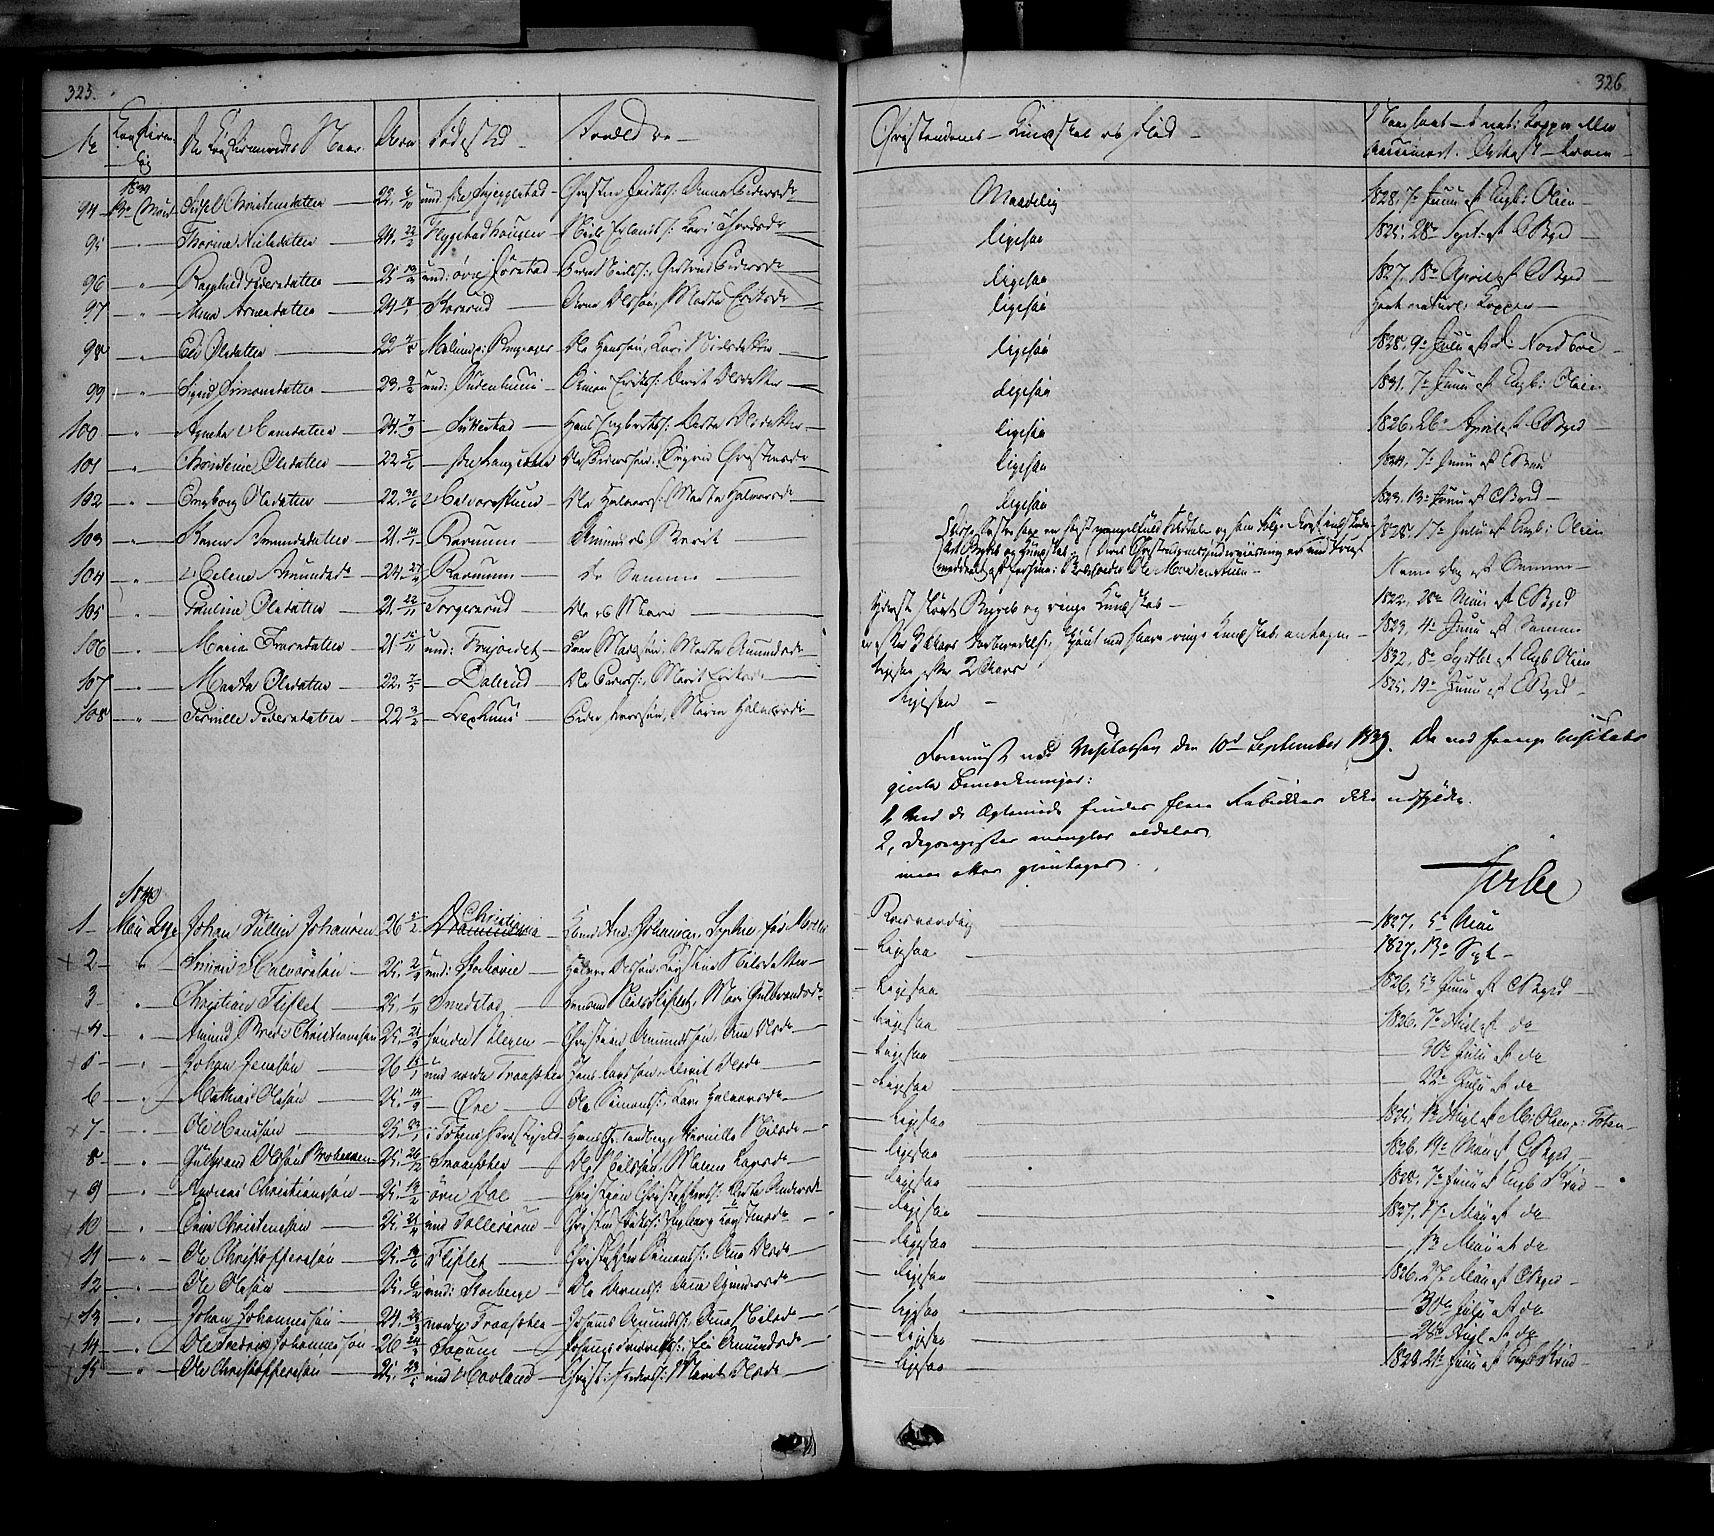 SAH, Fåberg prestekontor, Ministerialbok nr. 5, 1836-1854, s. 325-326